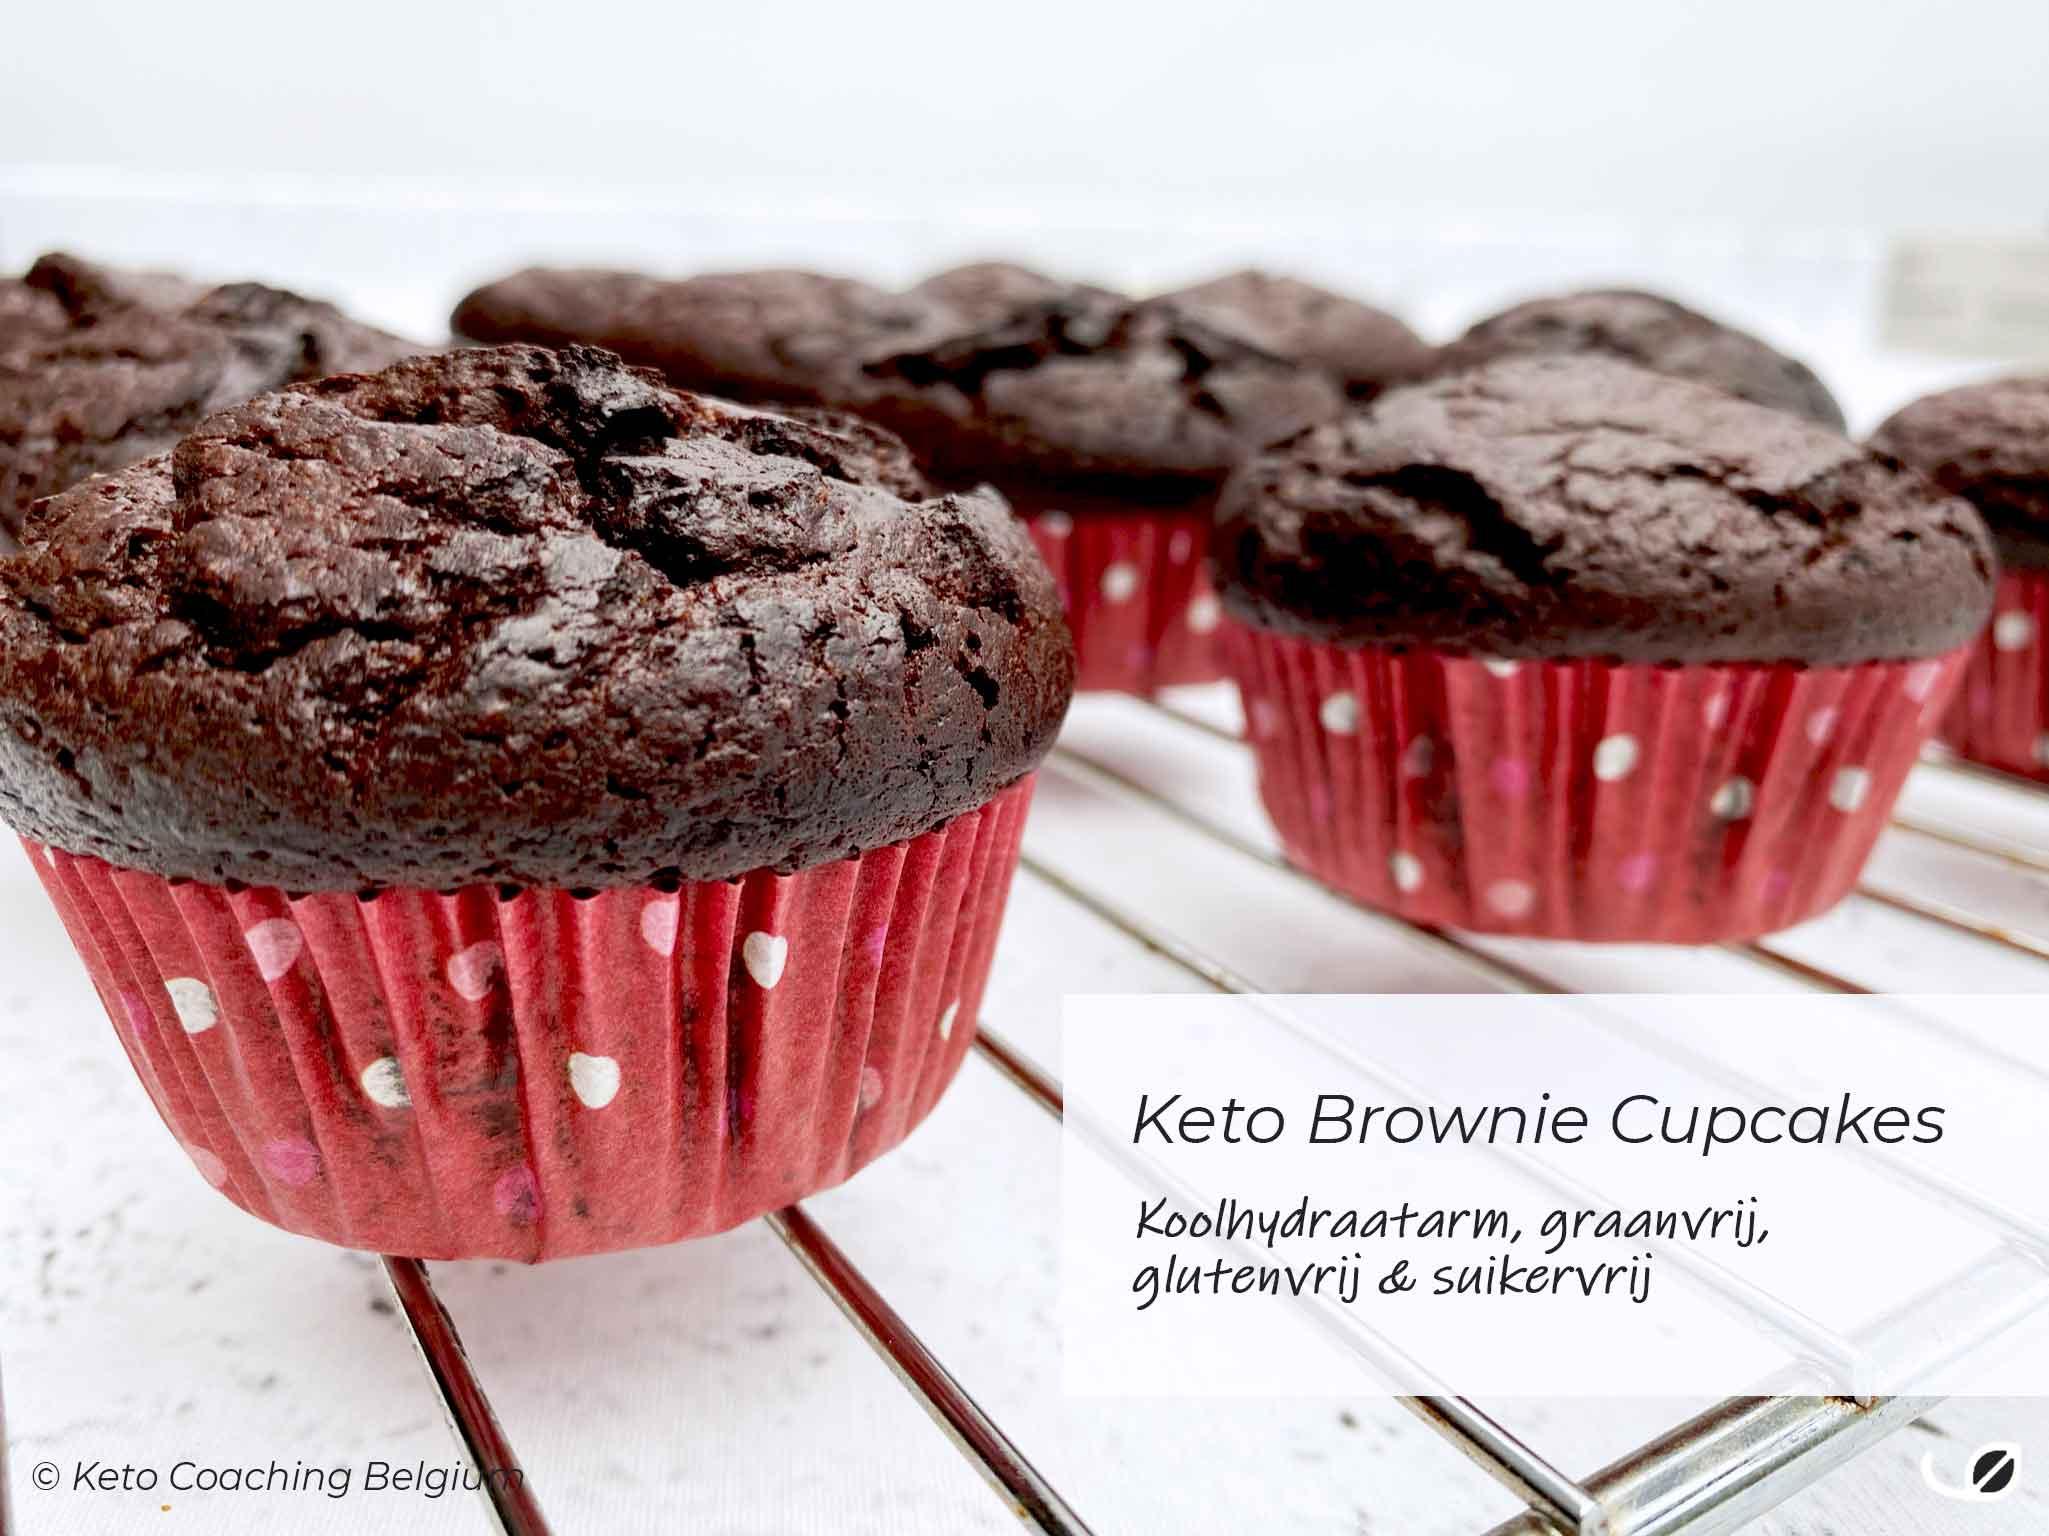 Keto brownie cupcakes - koolhydraatarme glutenvrije suikervrije cupcake brownies recept